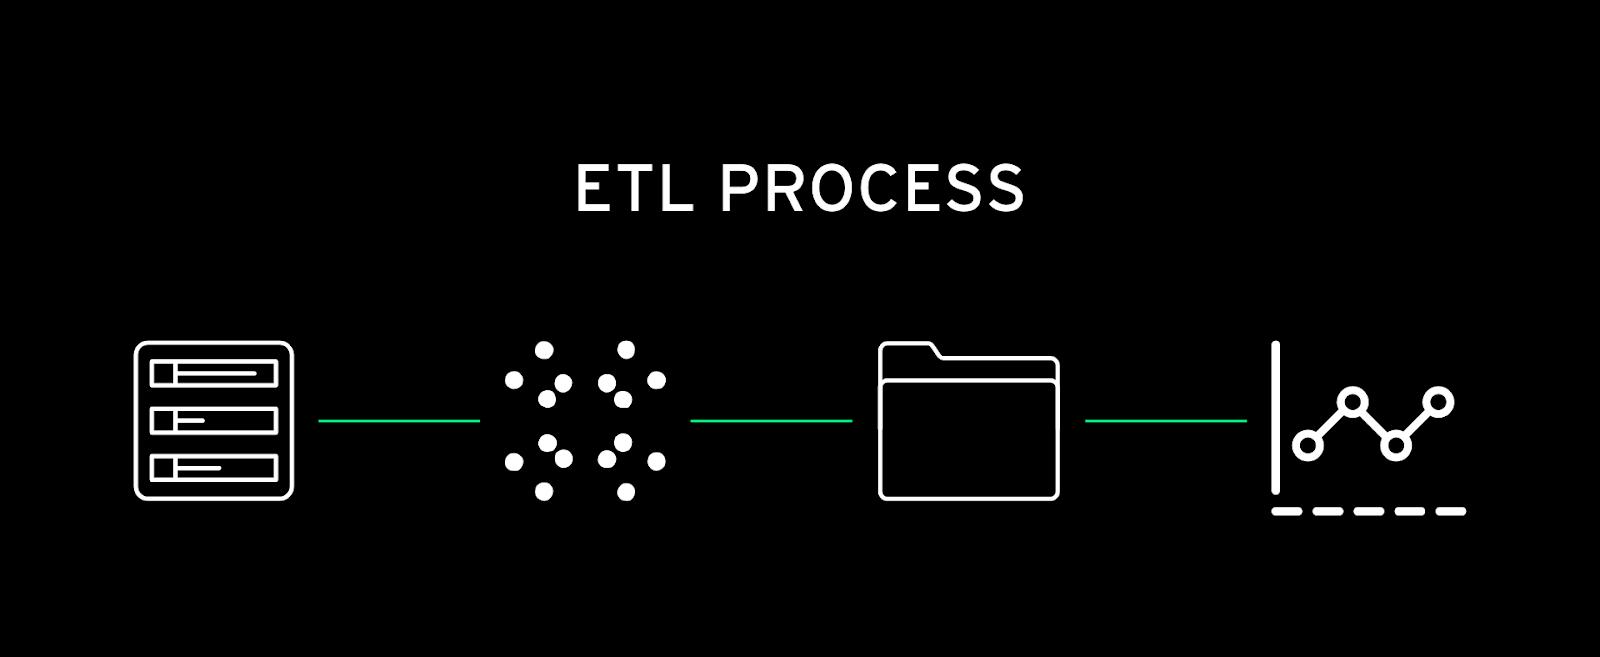 an ETL process diagram